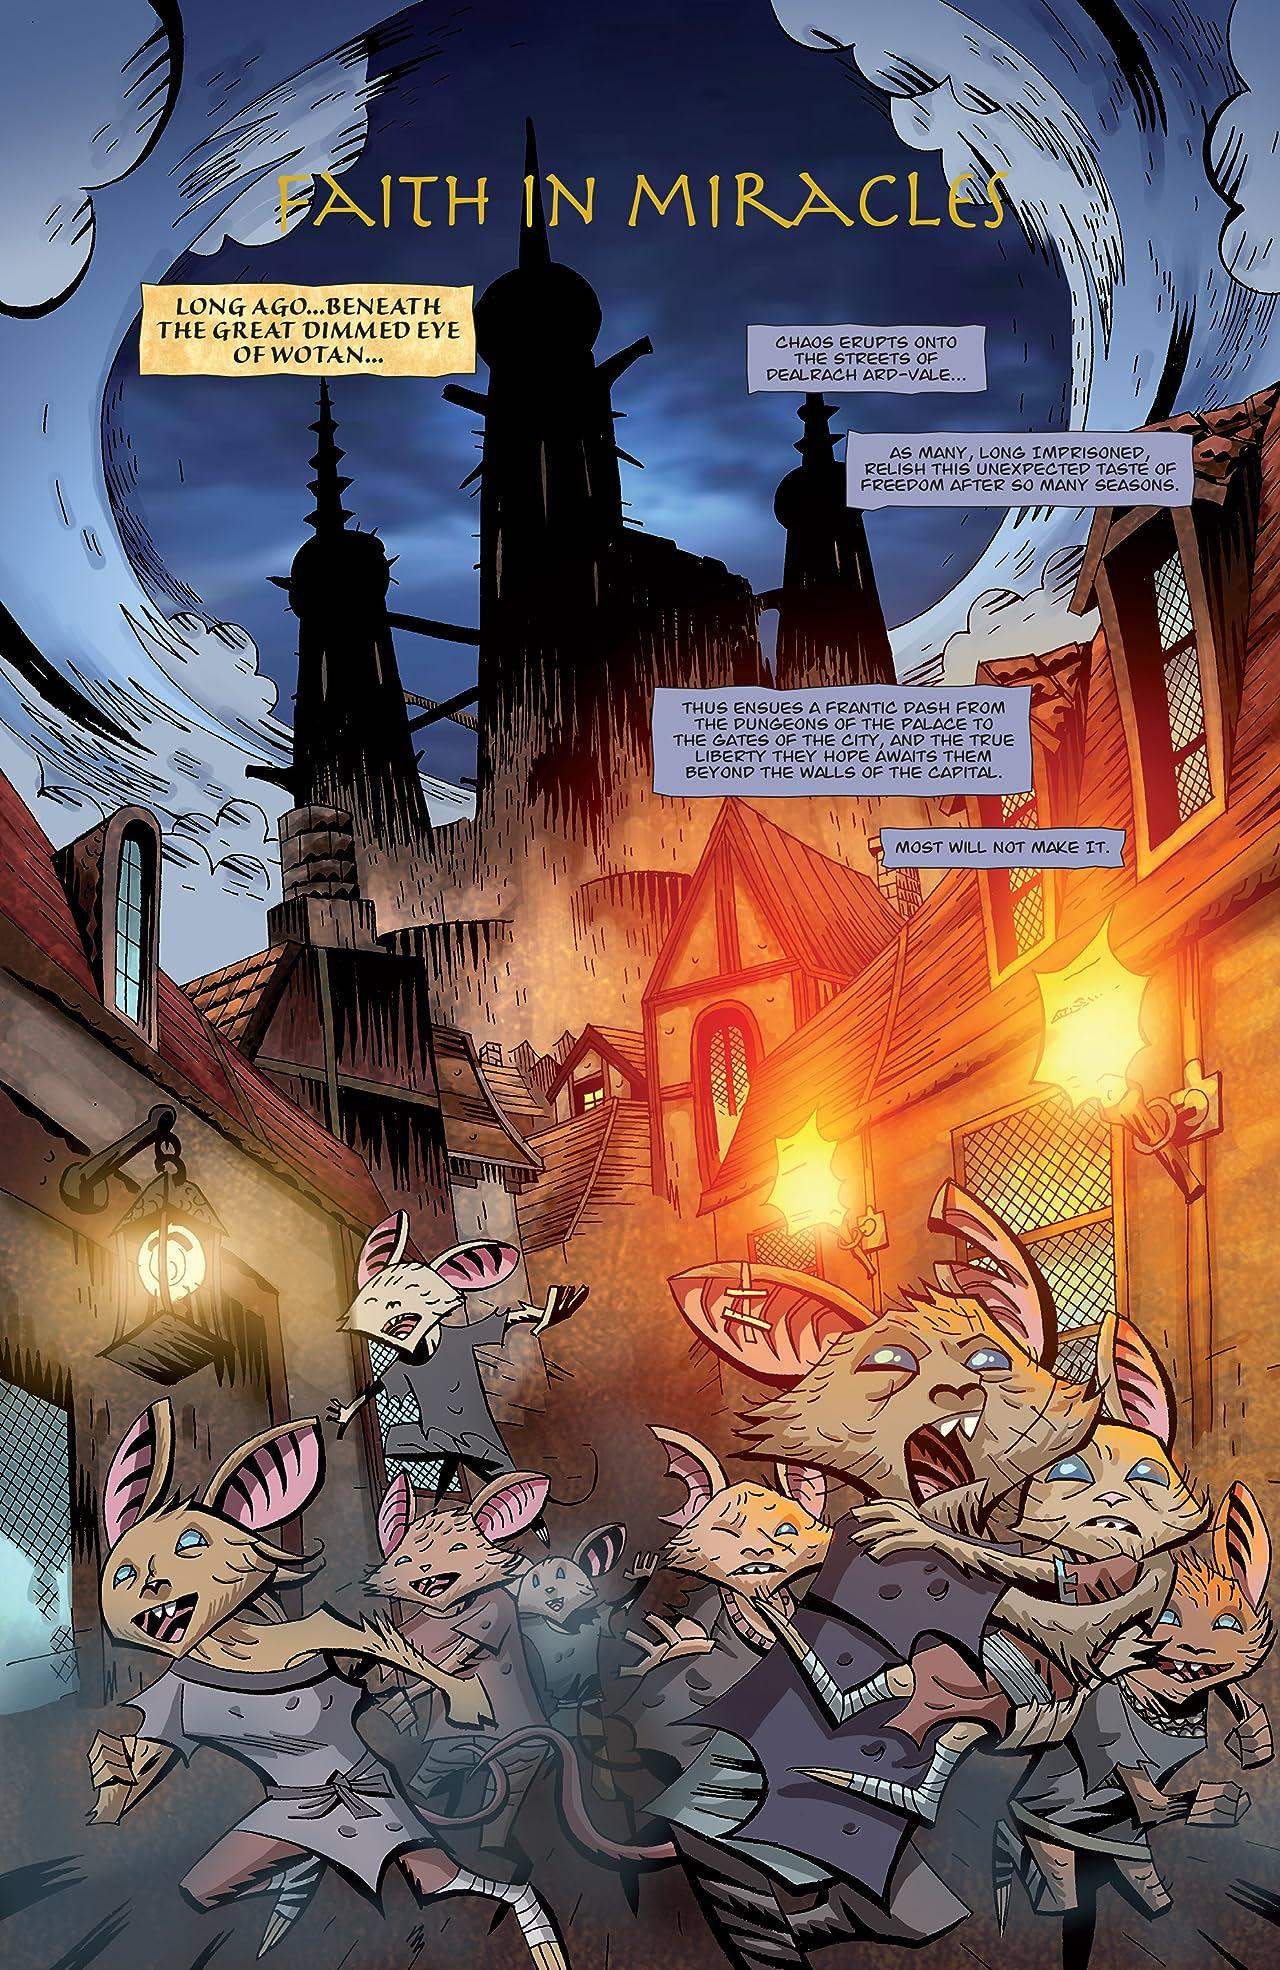 The Mice Templar Vol. 3: A Midwinter Night's Dream